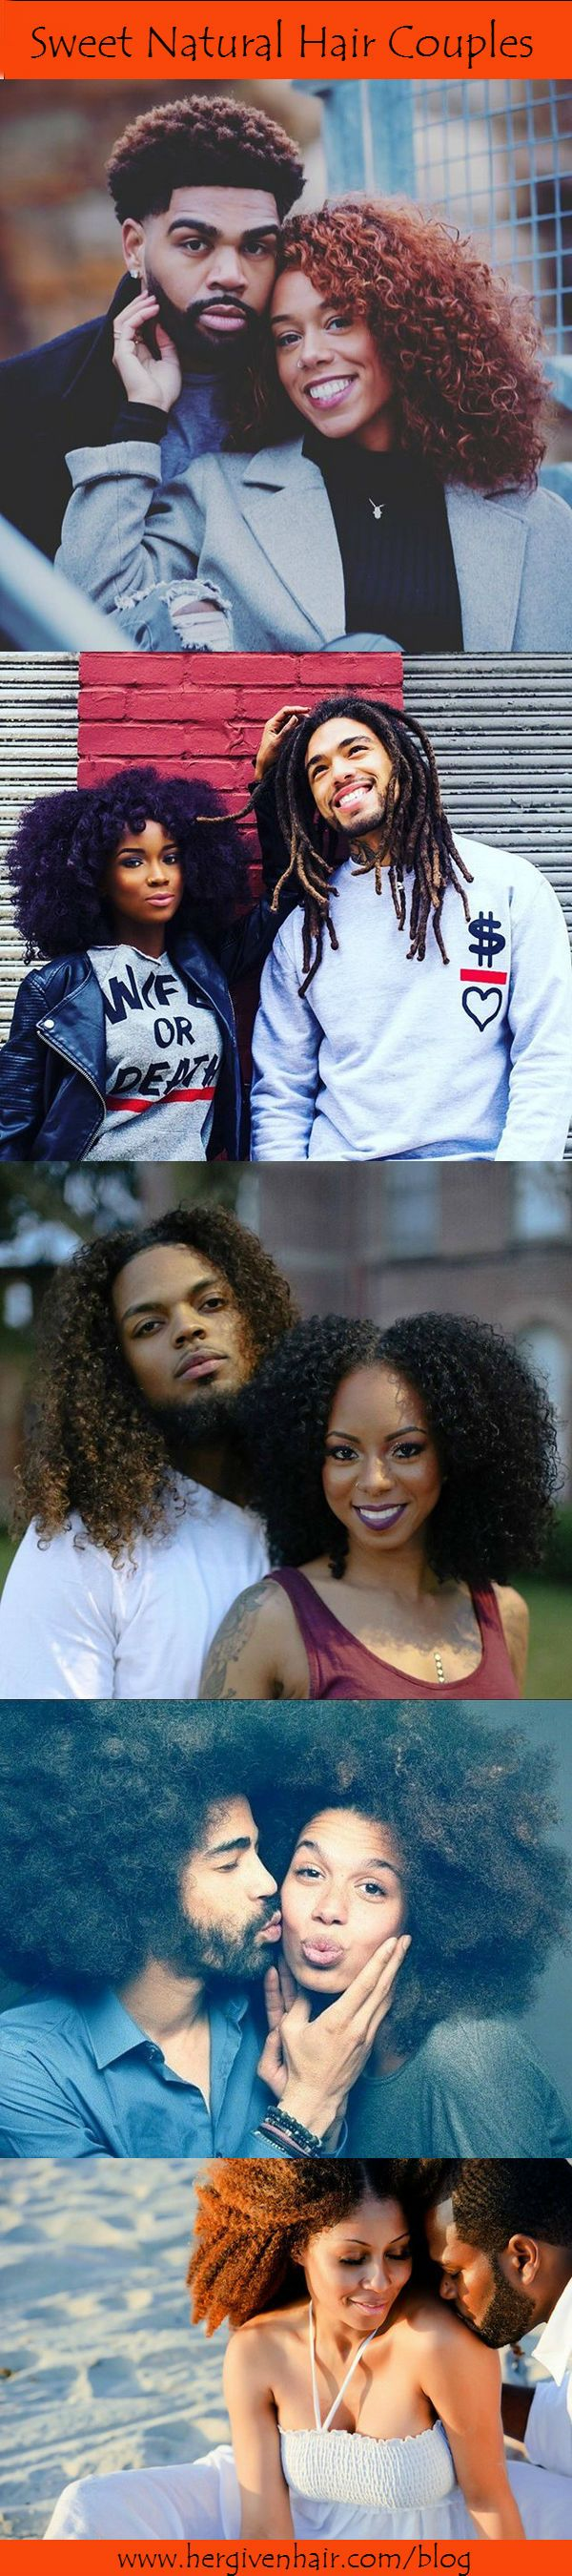 10 sweet natural hair couples on www.hergivenhair.com/blog  #naturallove #blacklove